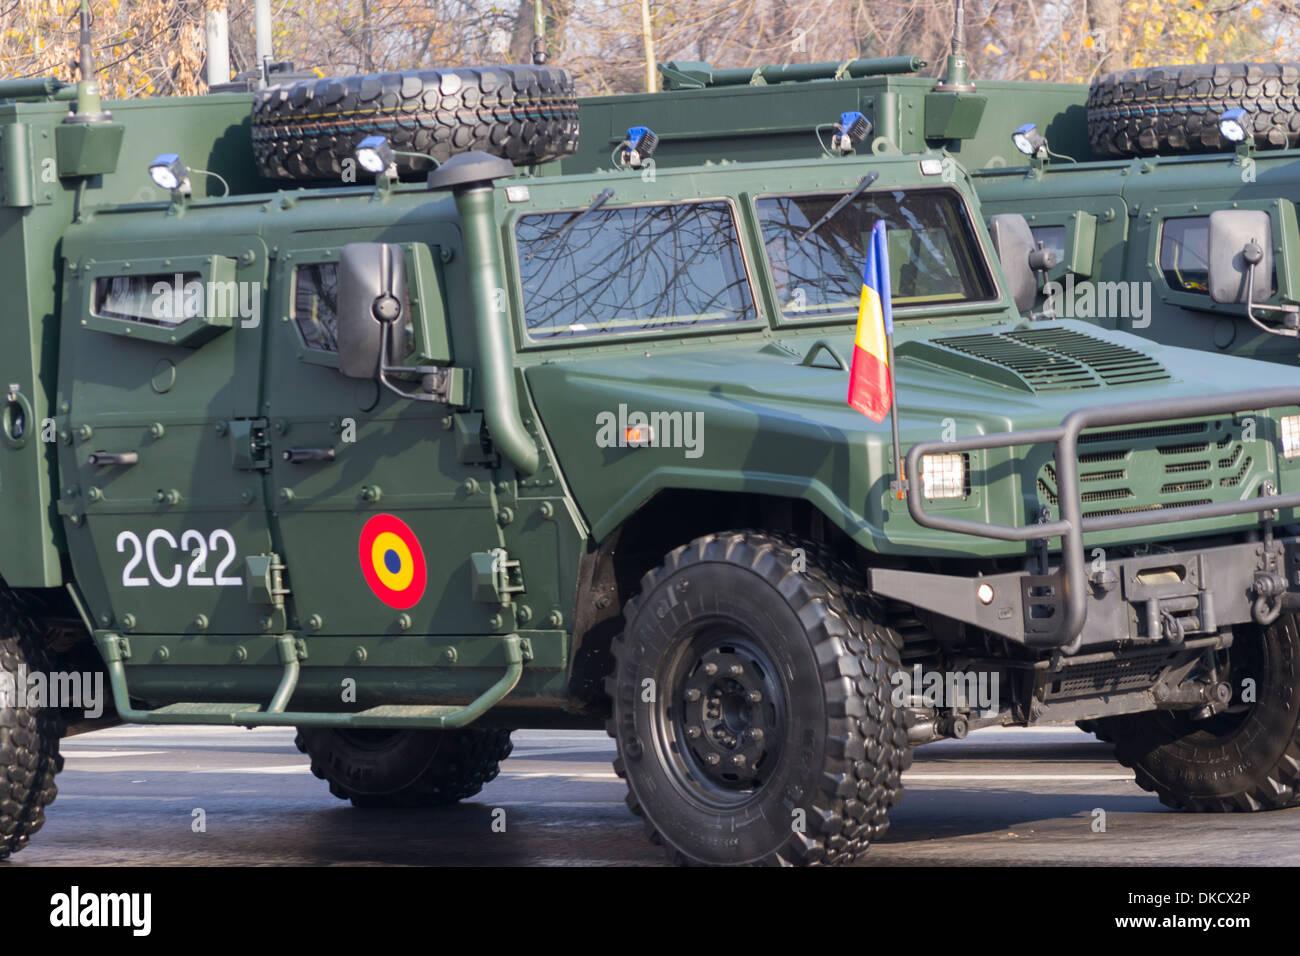 URO VAMTAC radio station vehicle - December 1st, Parade on Romania's National Day - Stock Image